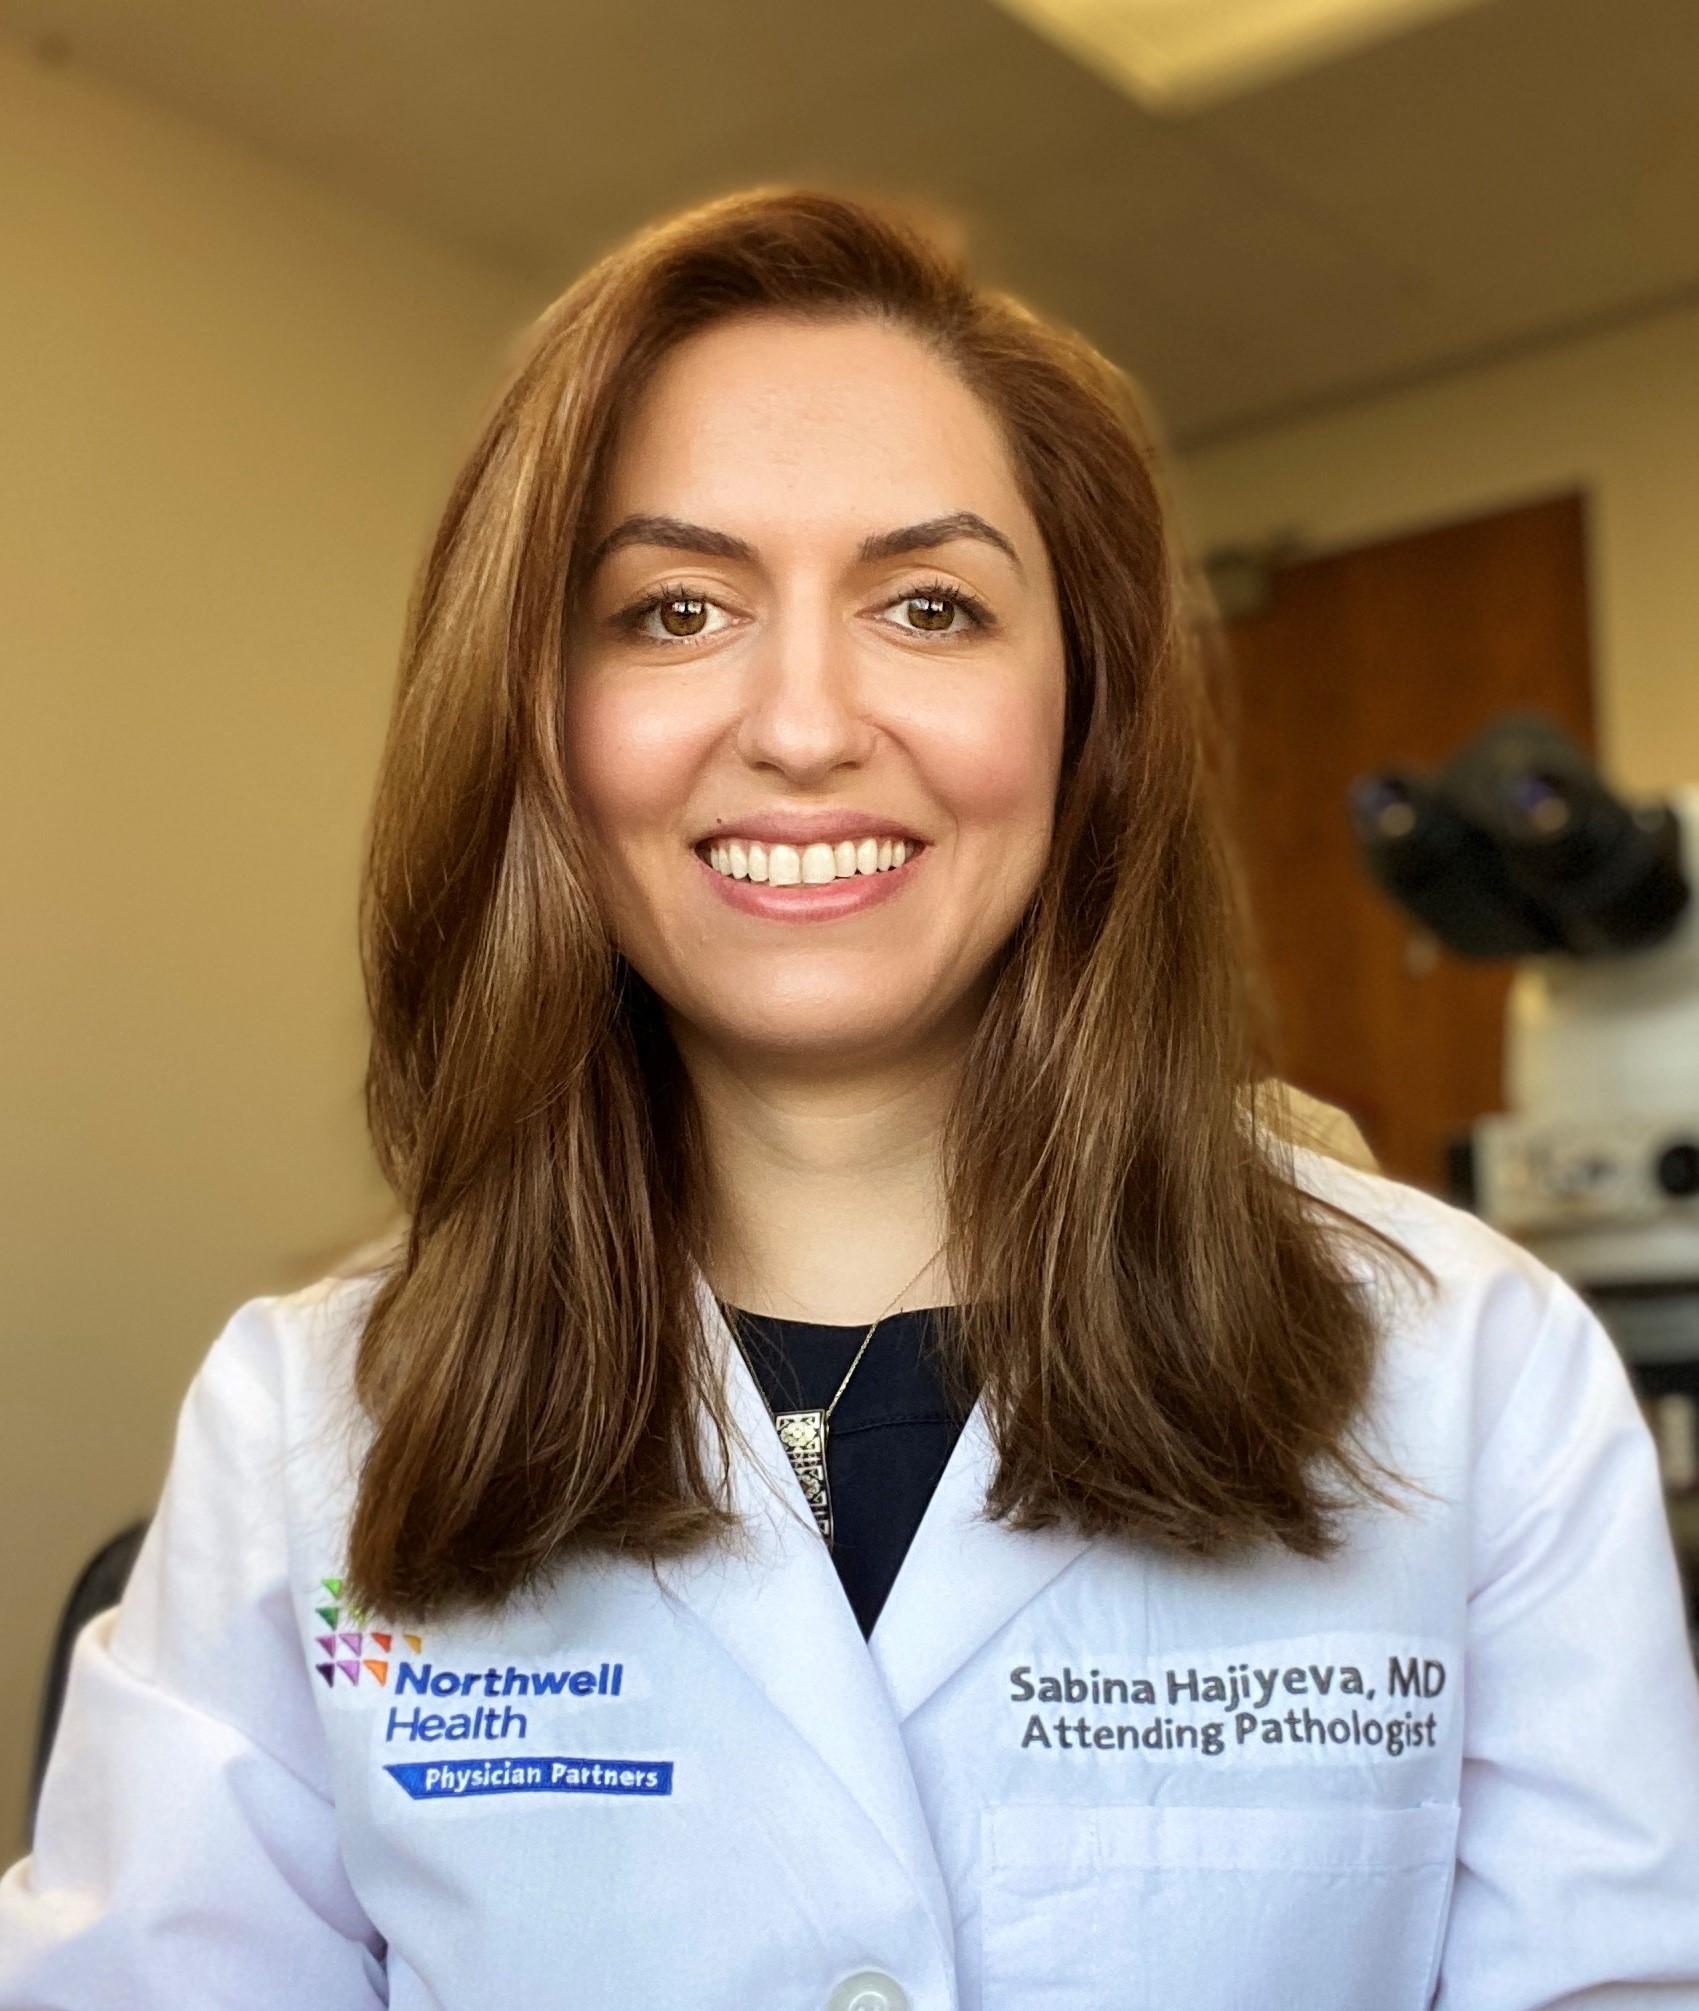 Sabina Hajiyeva, M.D.